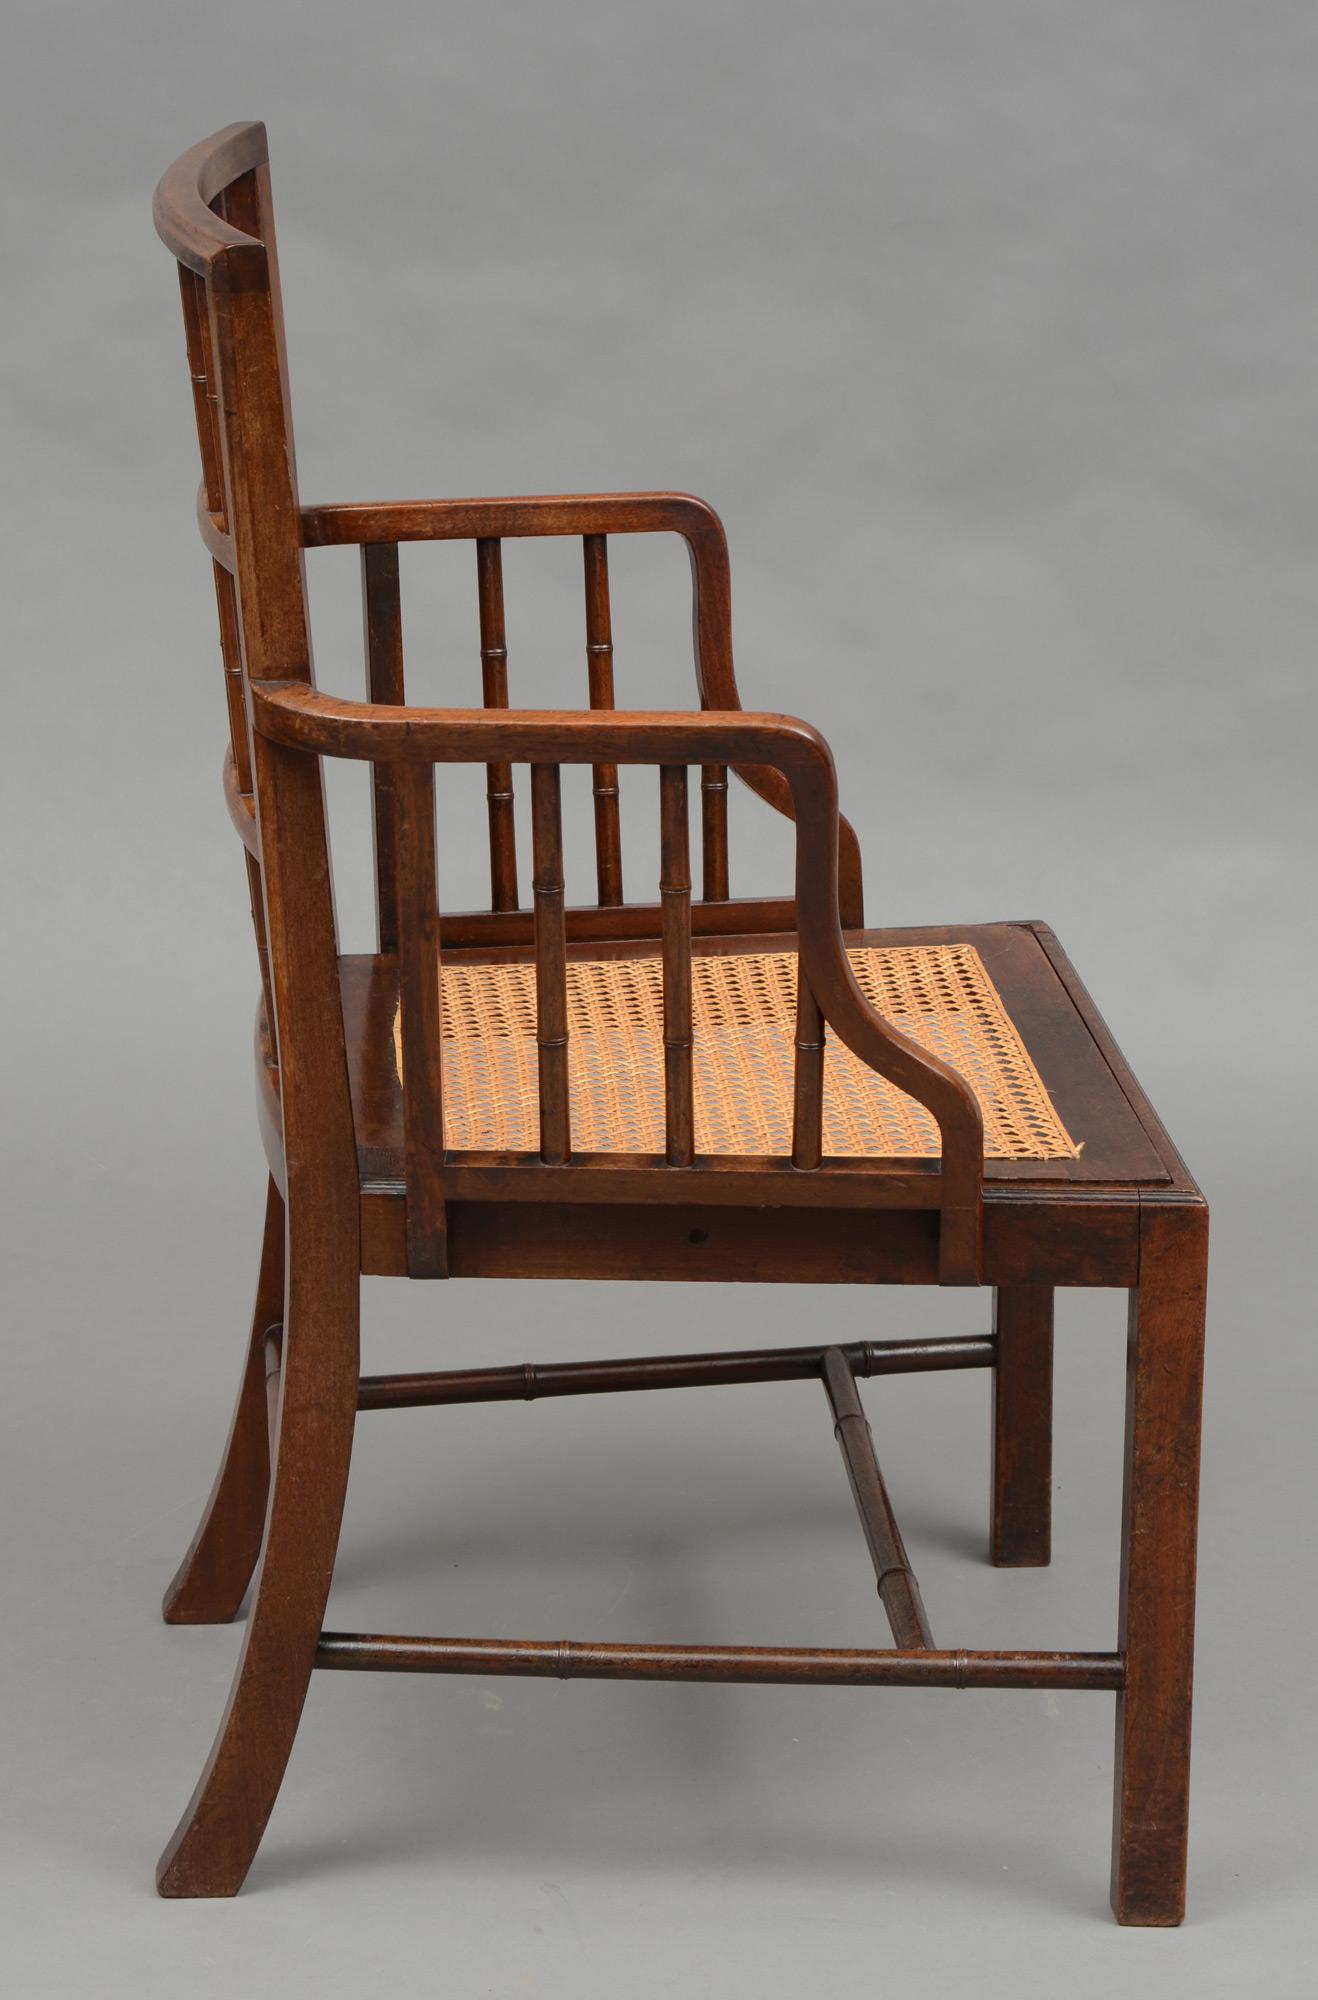 ... English Antique Rare Georgian Faux Bamboo Armchair, 18th Century ...